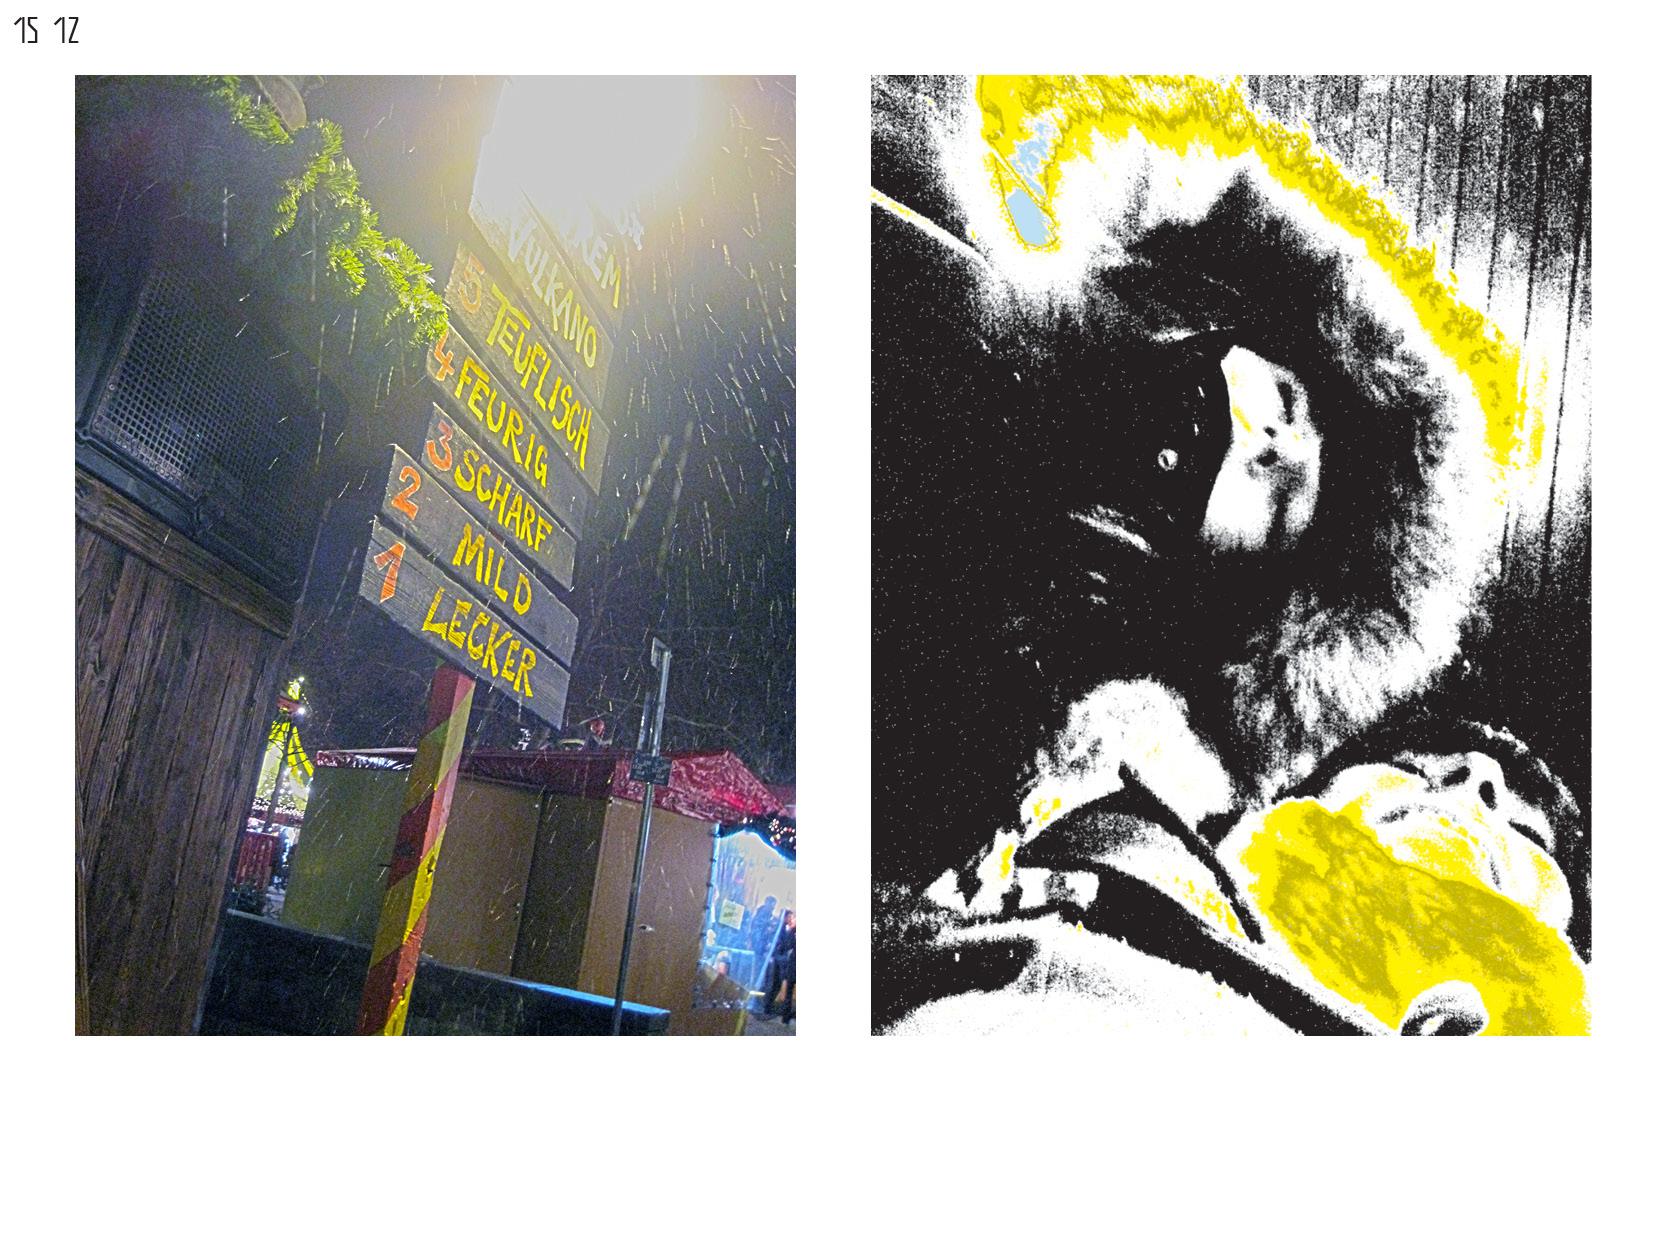 Gerrit-Schweiger-Dialog-Städte-Paris-Berlin-Jessica-Blank-Experiment-Fotoserie-Tagebuch-visuelle-Kommunikation-56